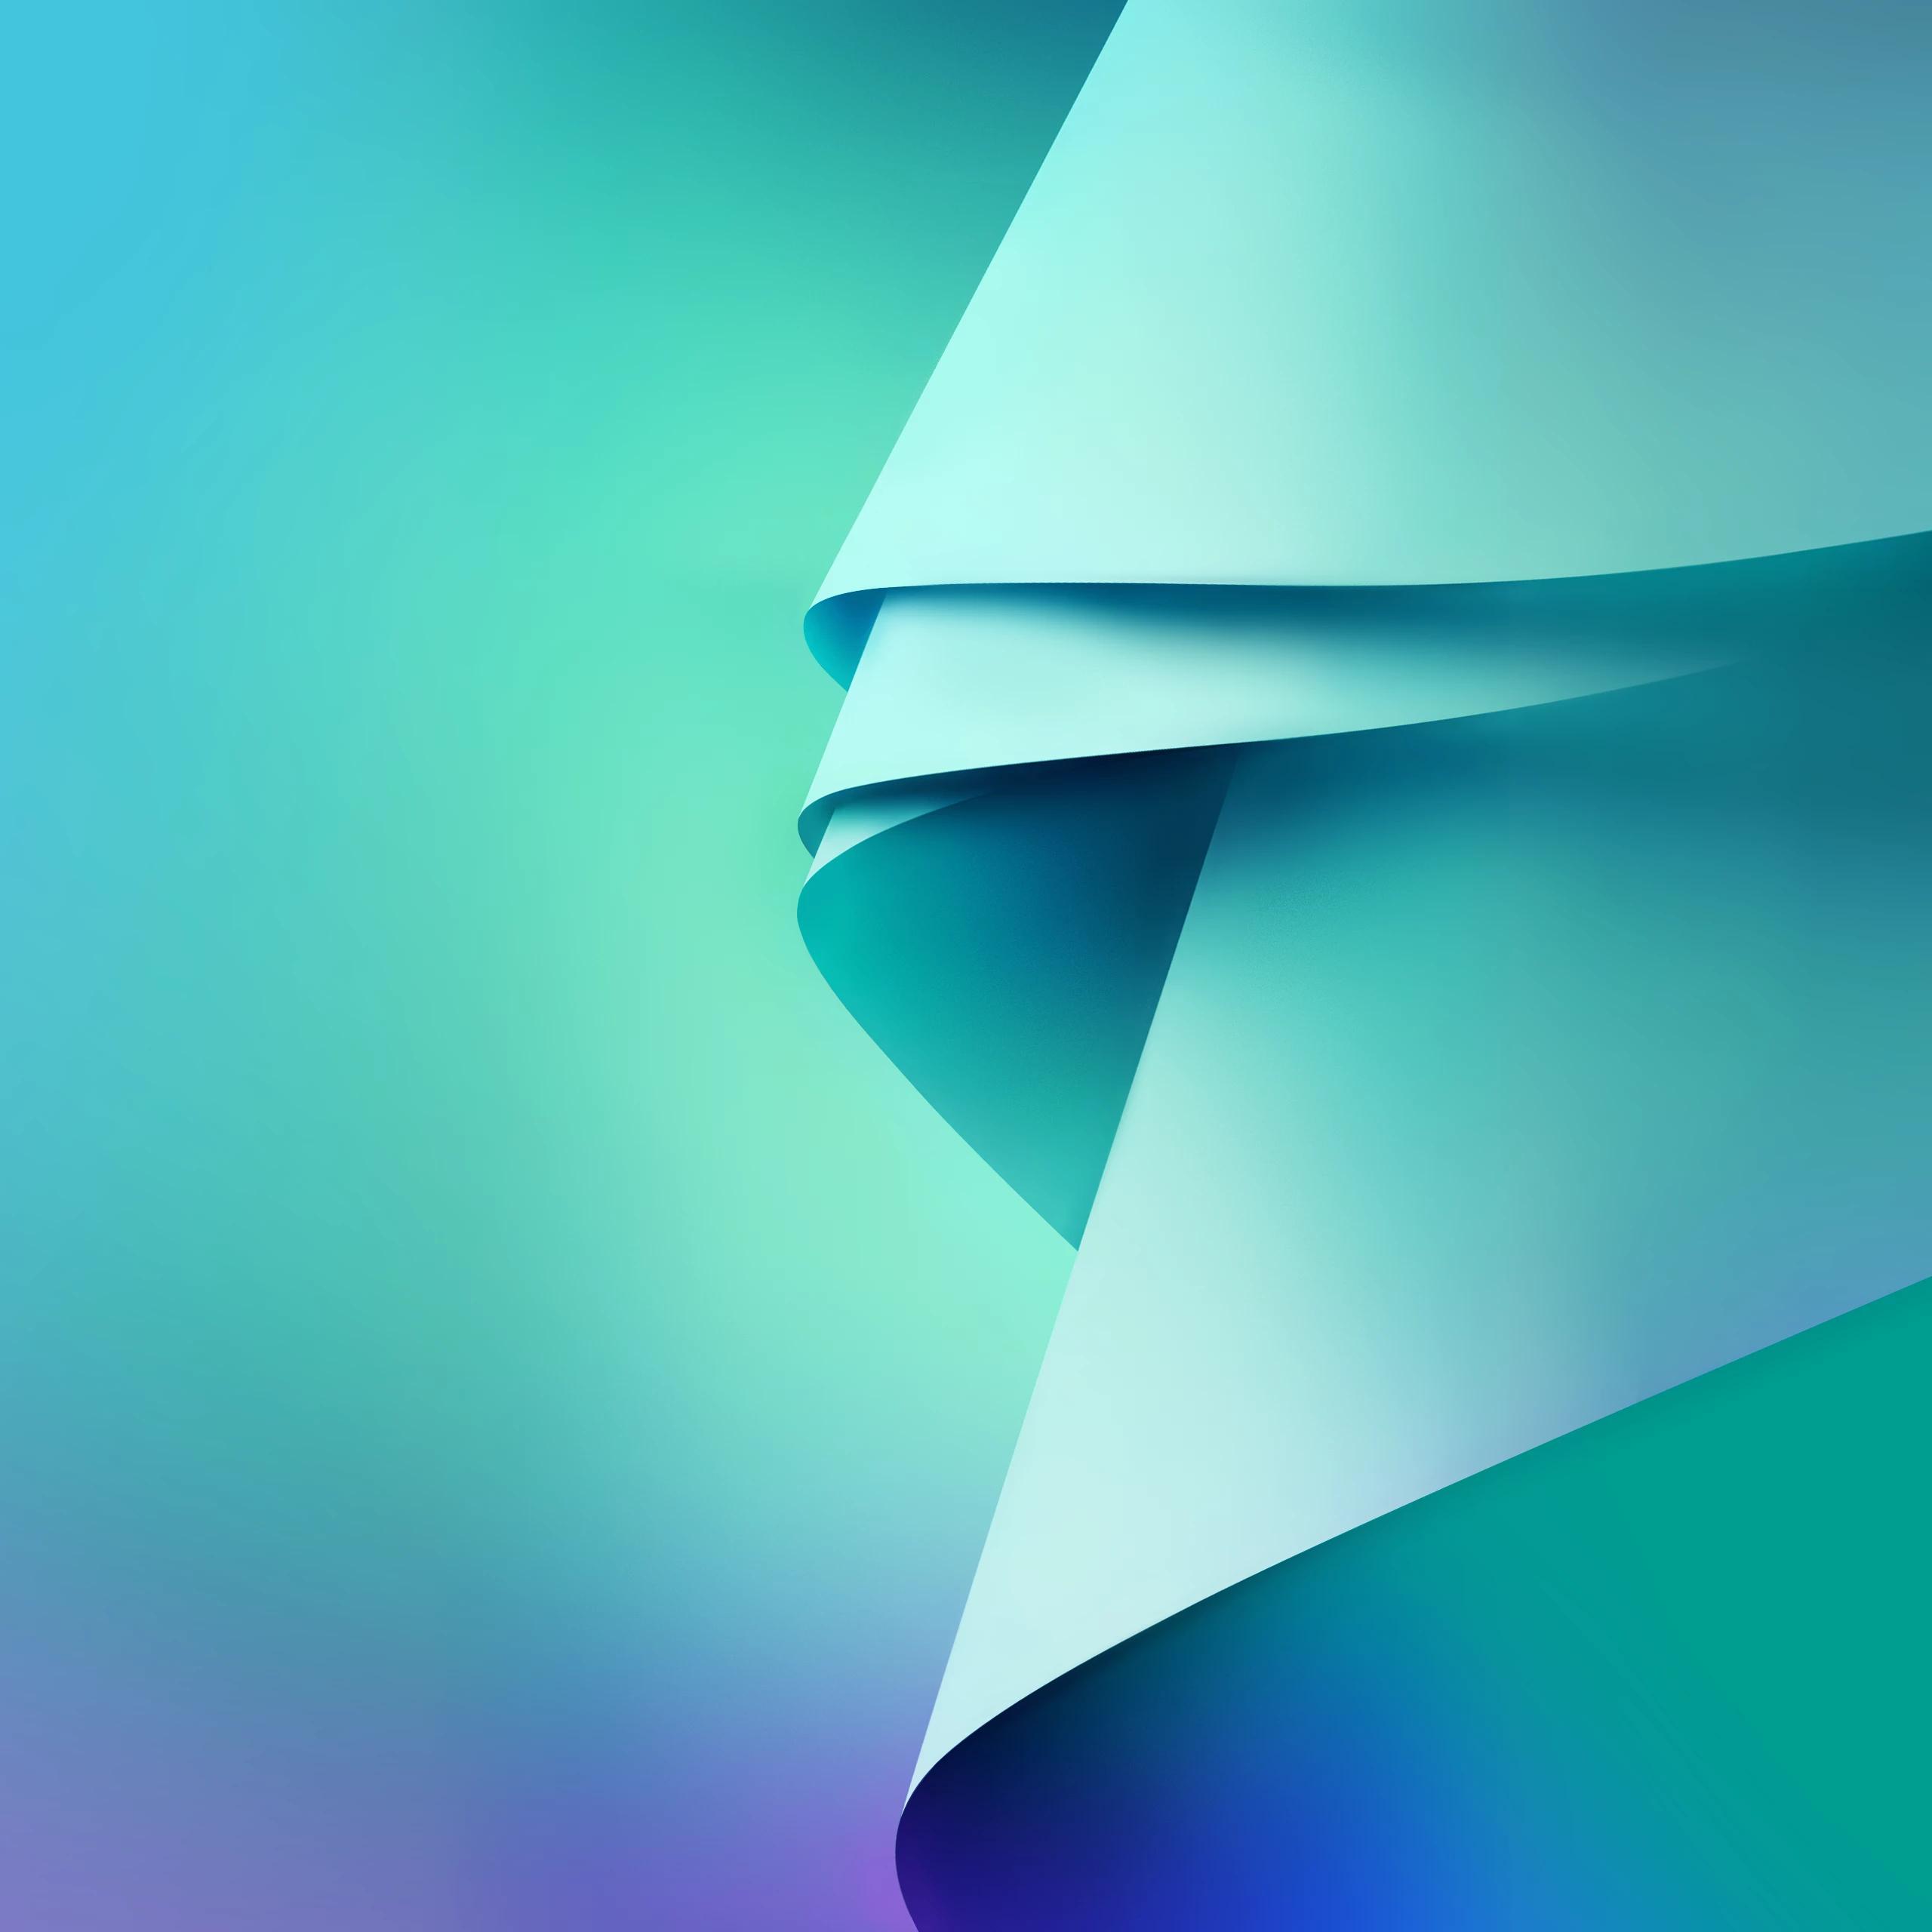 Download Wallpaper Galaxy Note 5